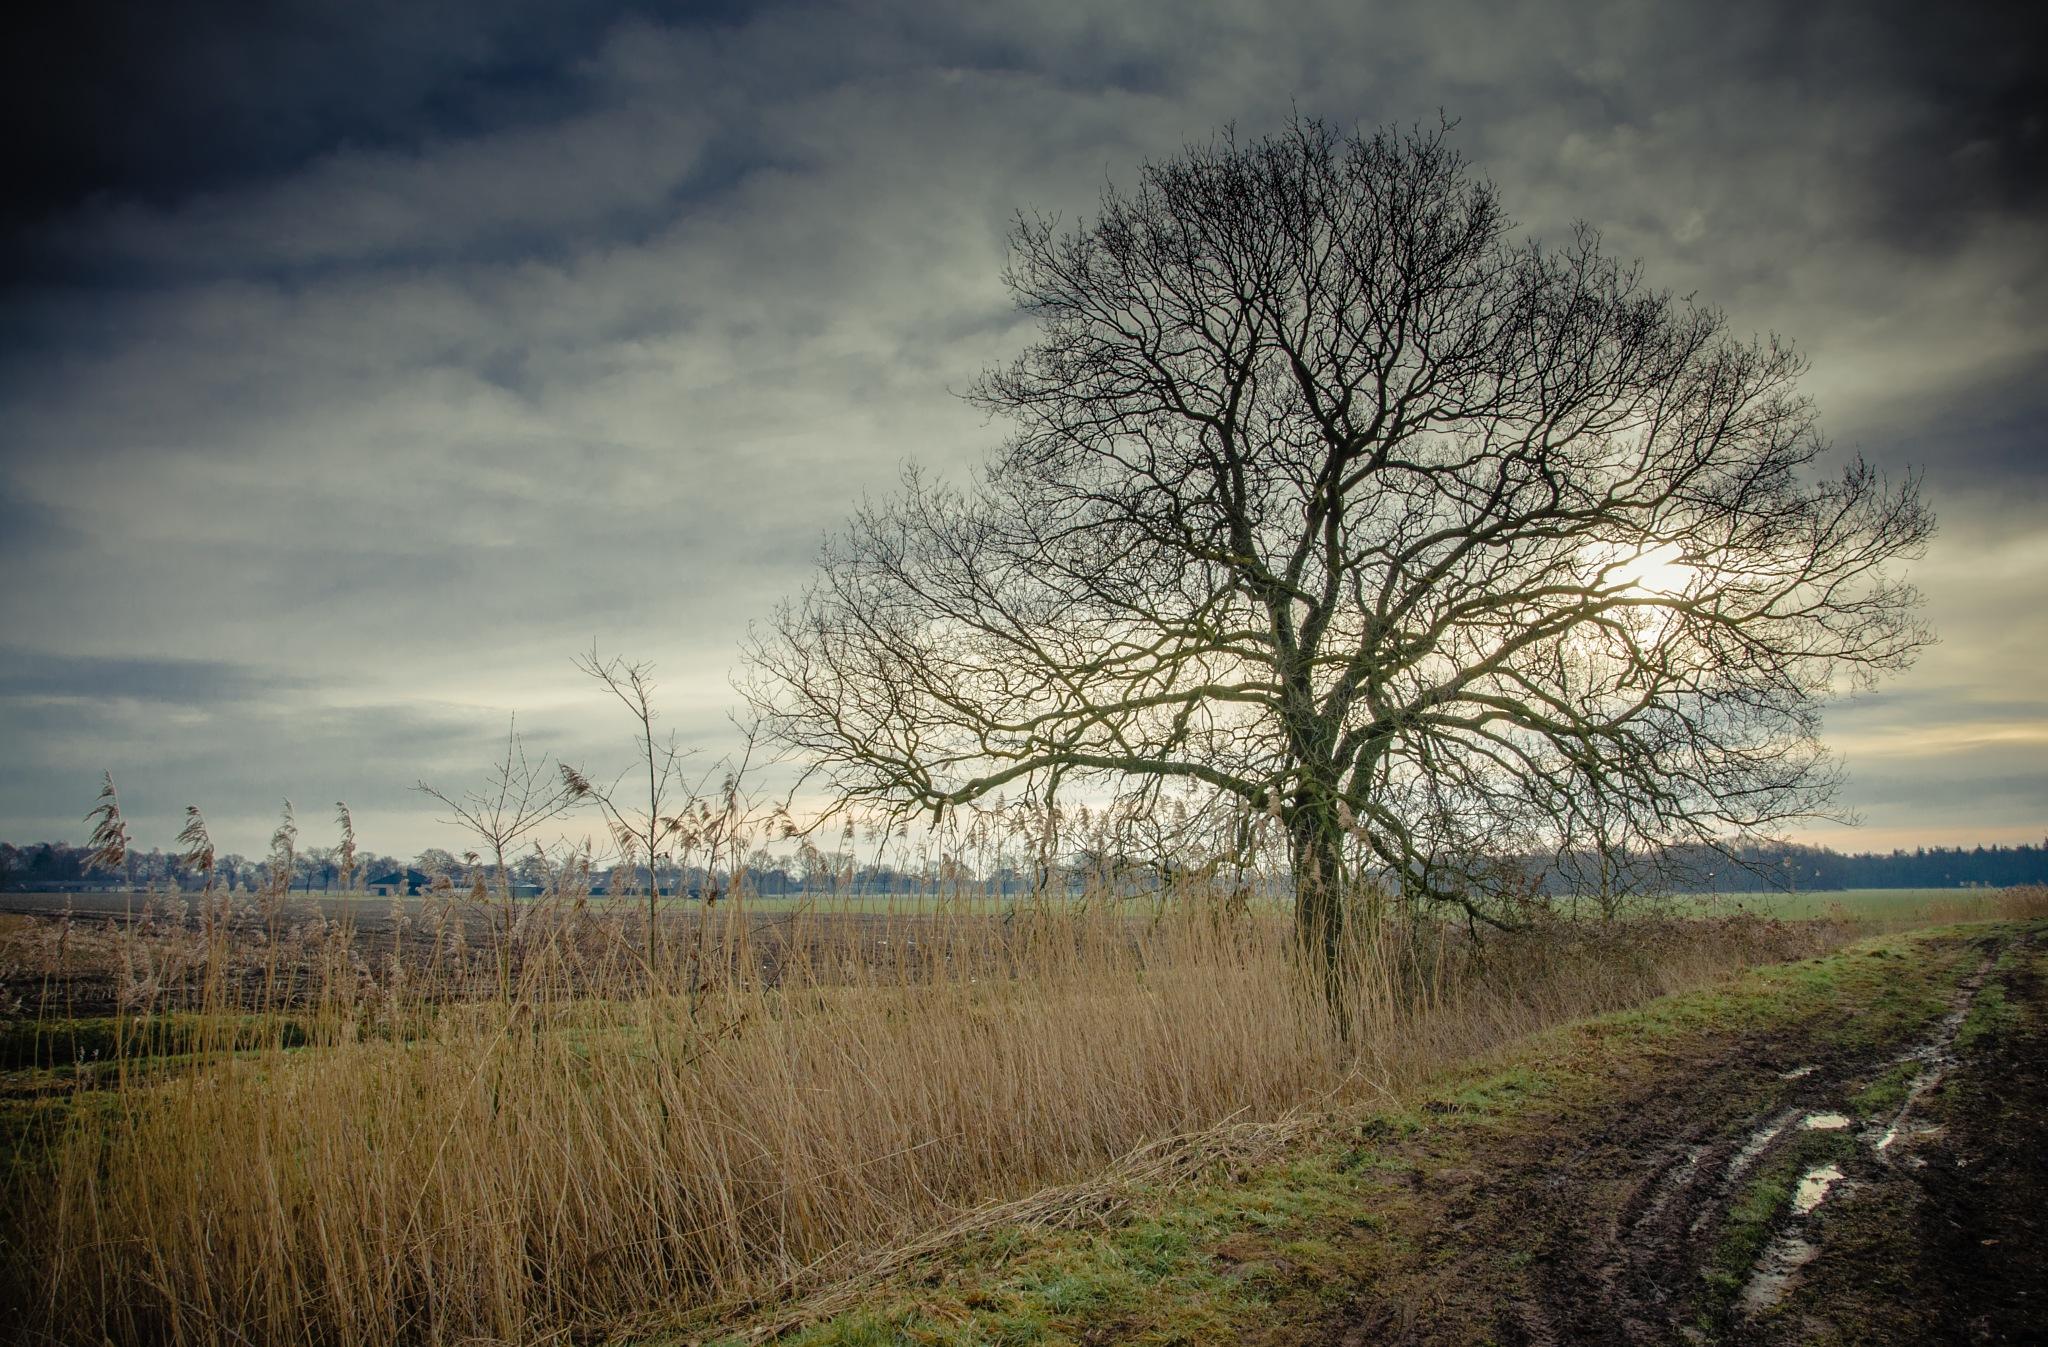 country morning by Marcin Majkowski